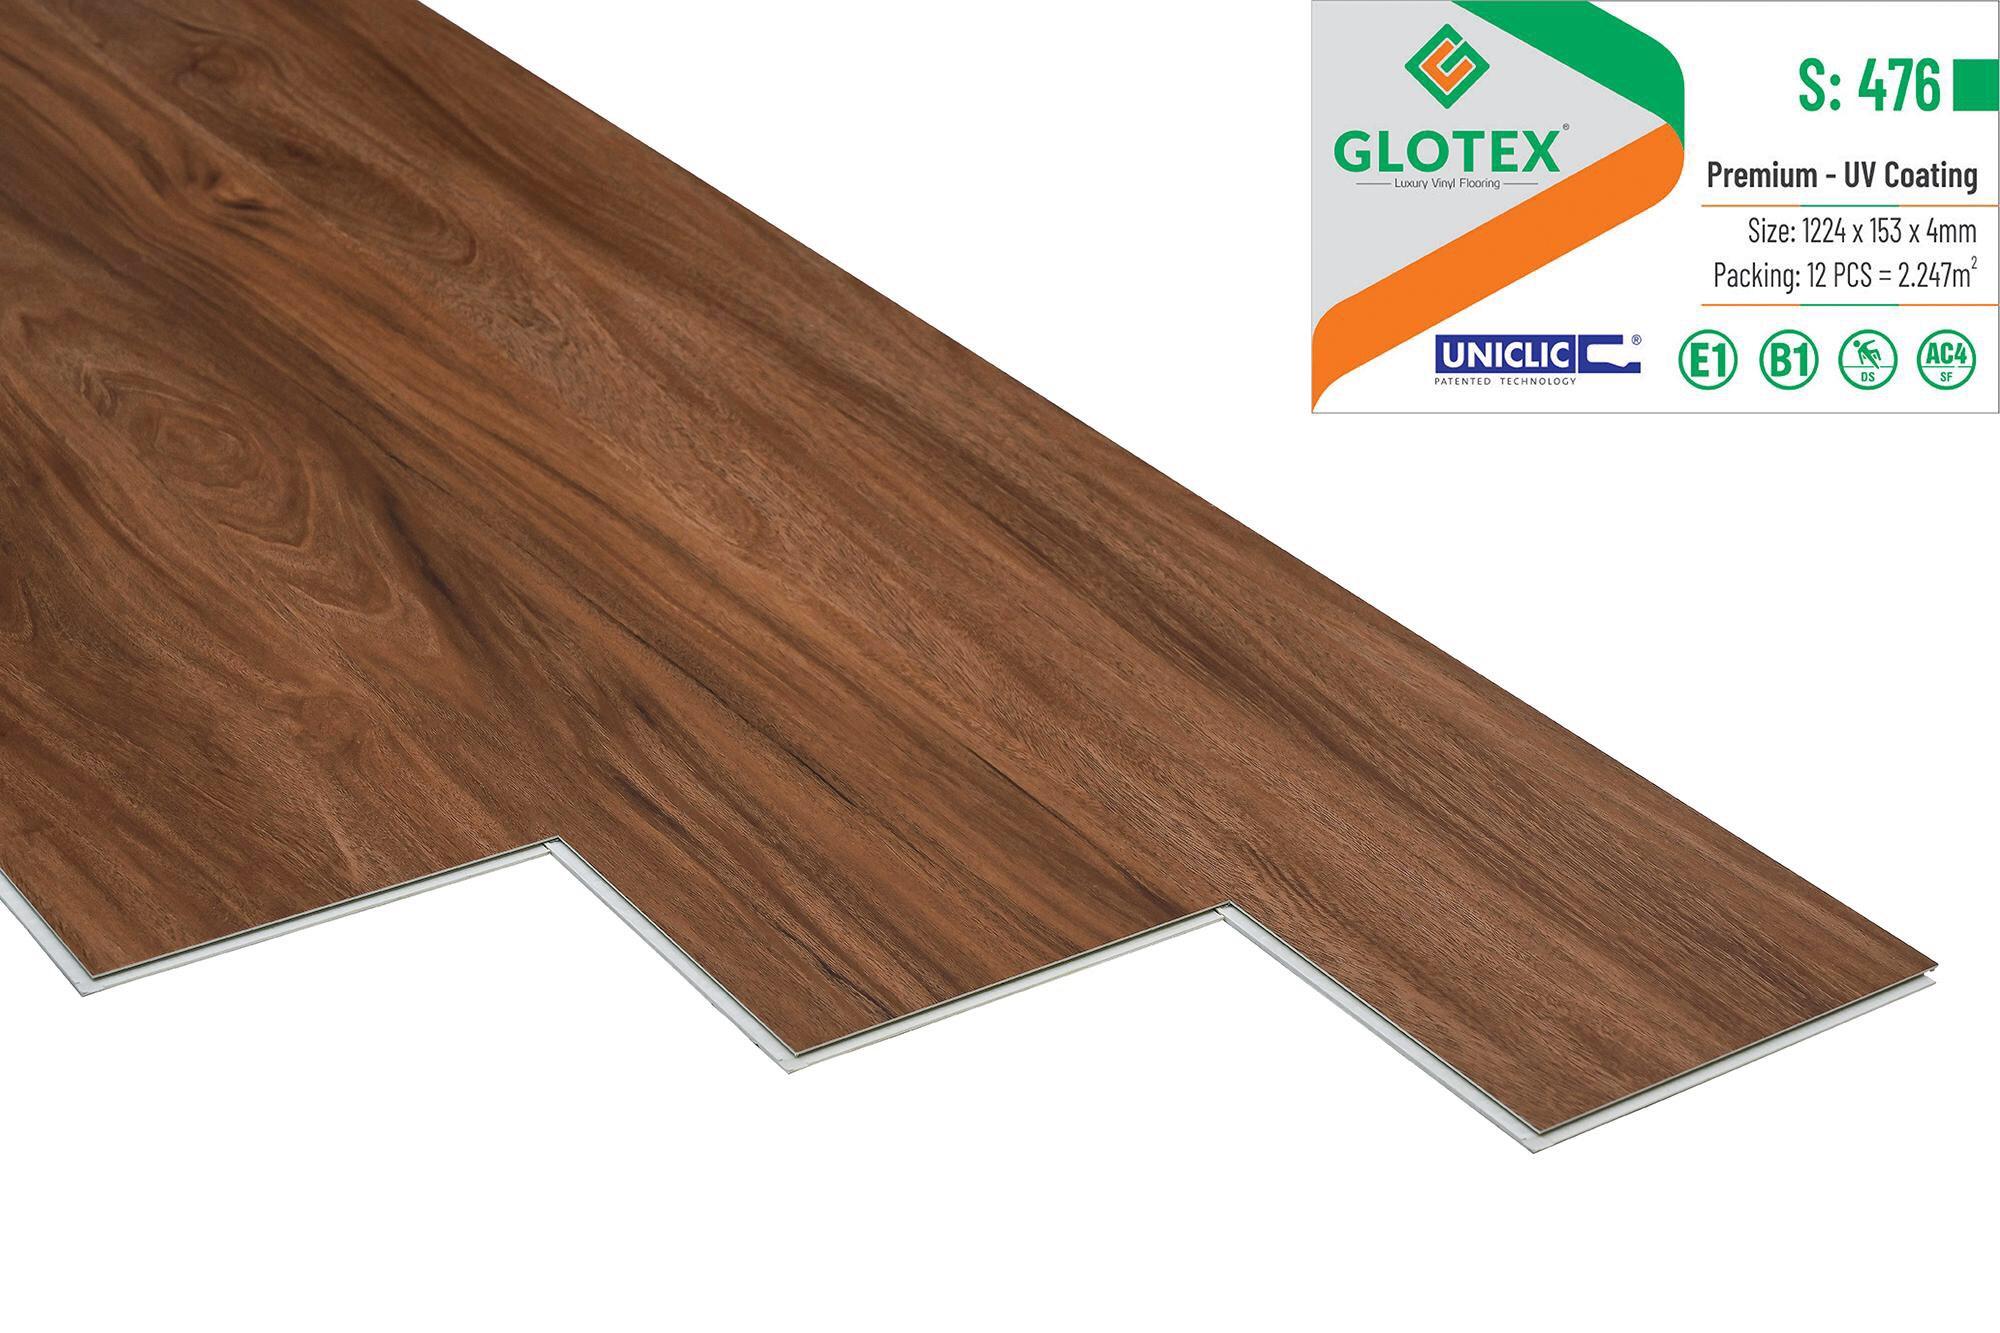 Sàn Nhựa Hèm Khóa GLOTEX S: 476